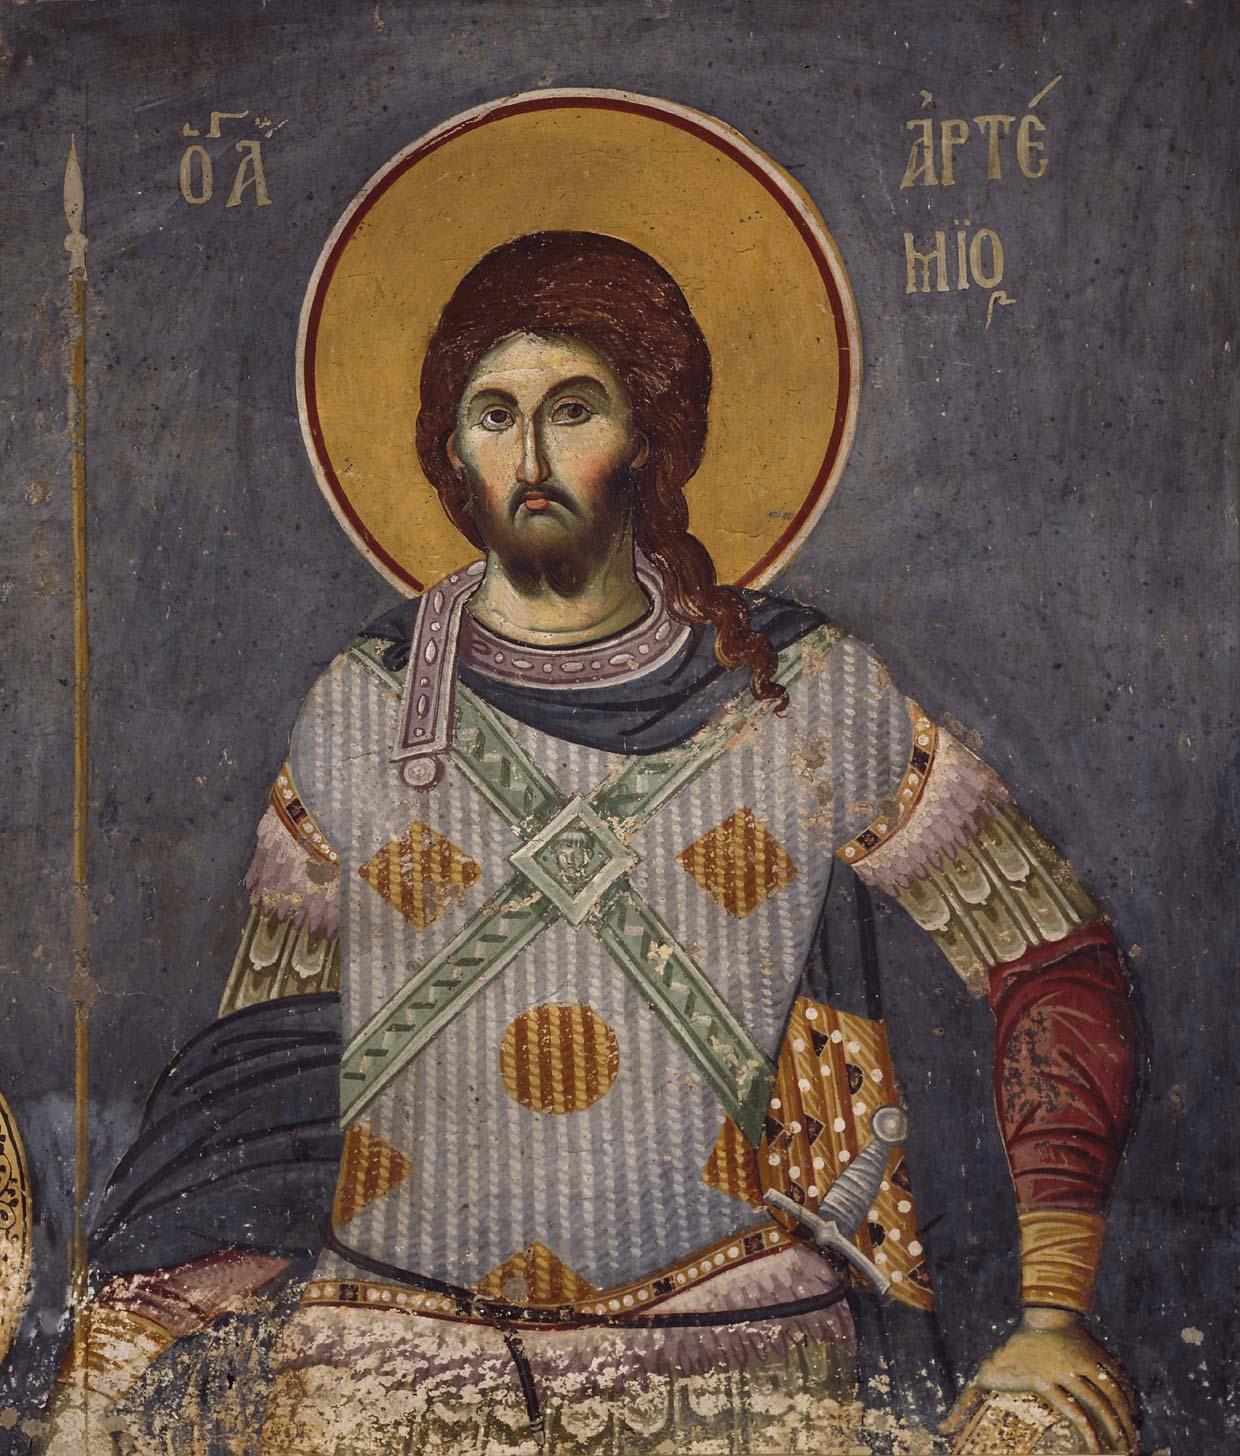 Saint Artème